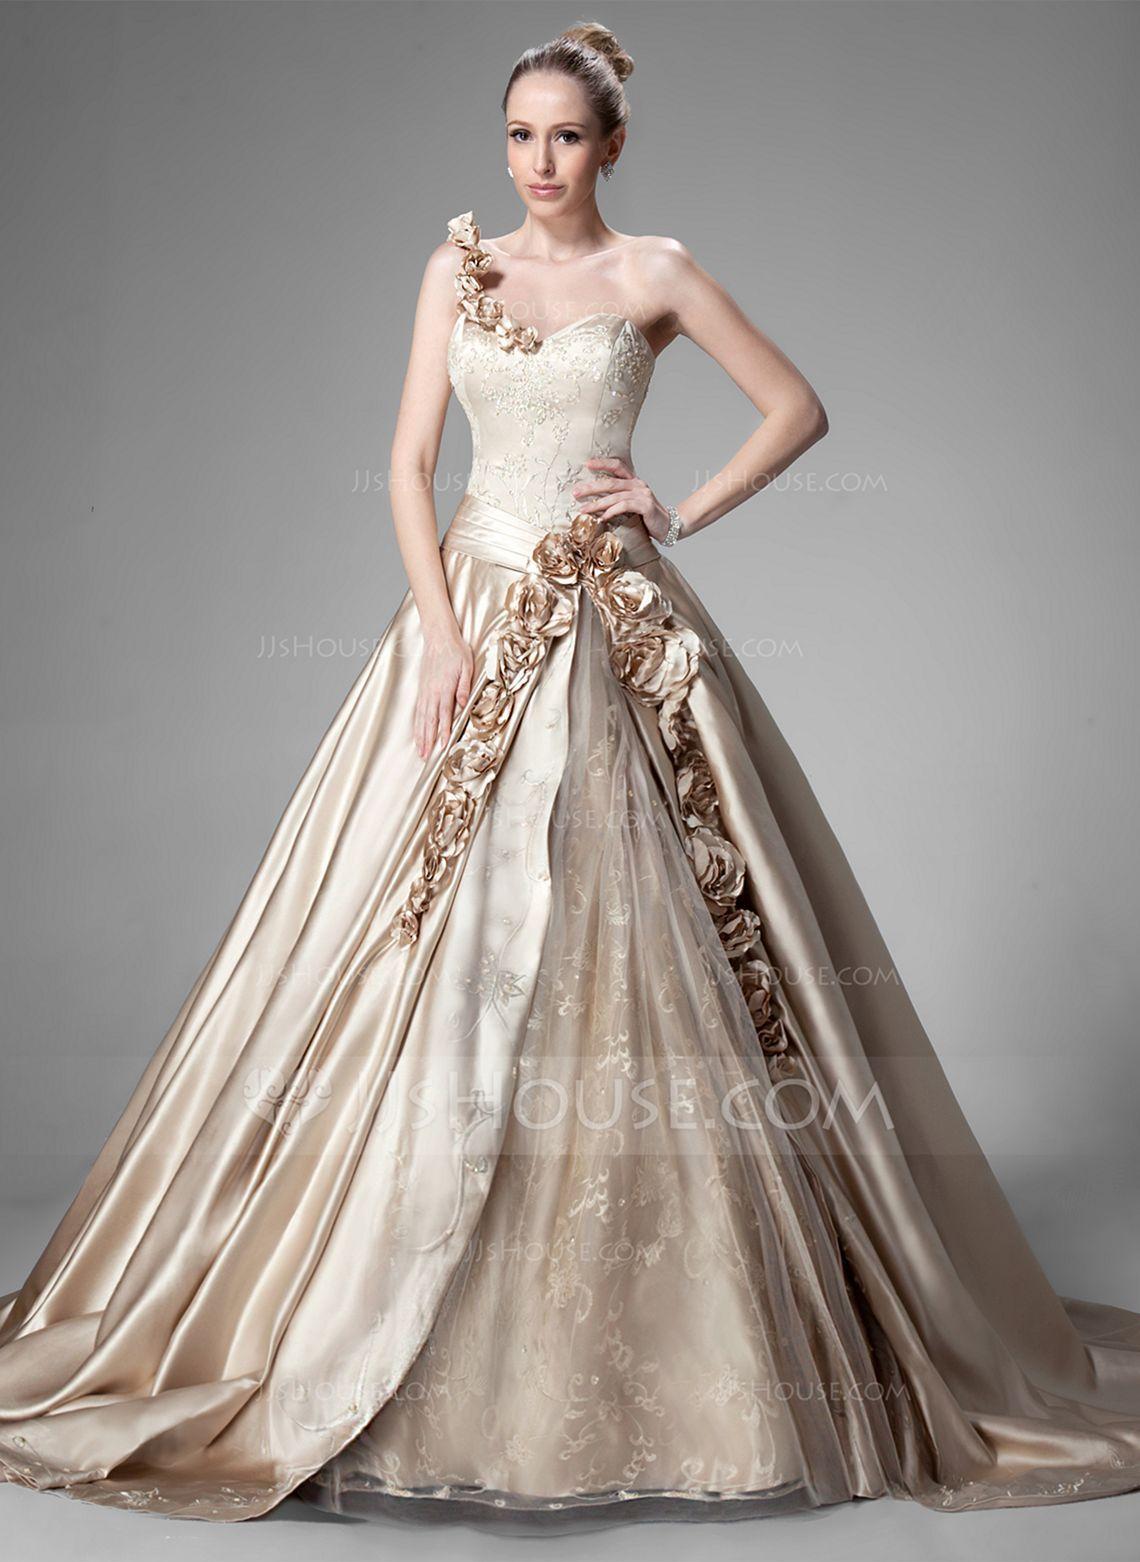 Gorgeous wedding chapel wedding dresses ideas wedding dresses